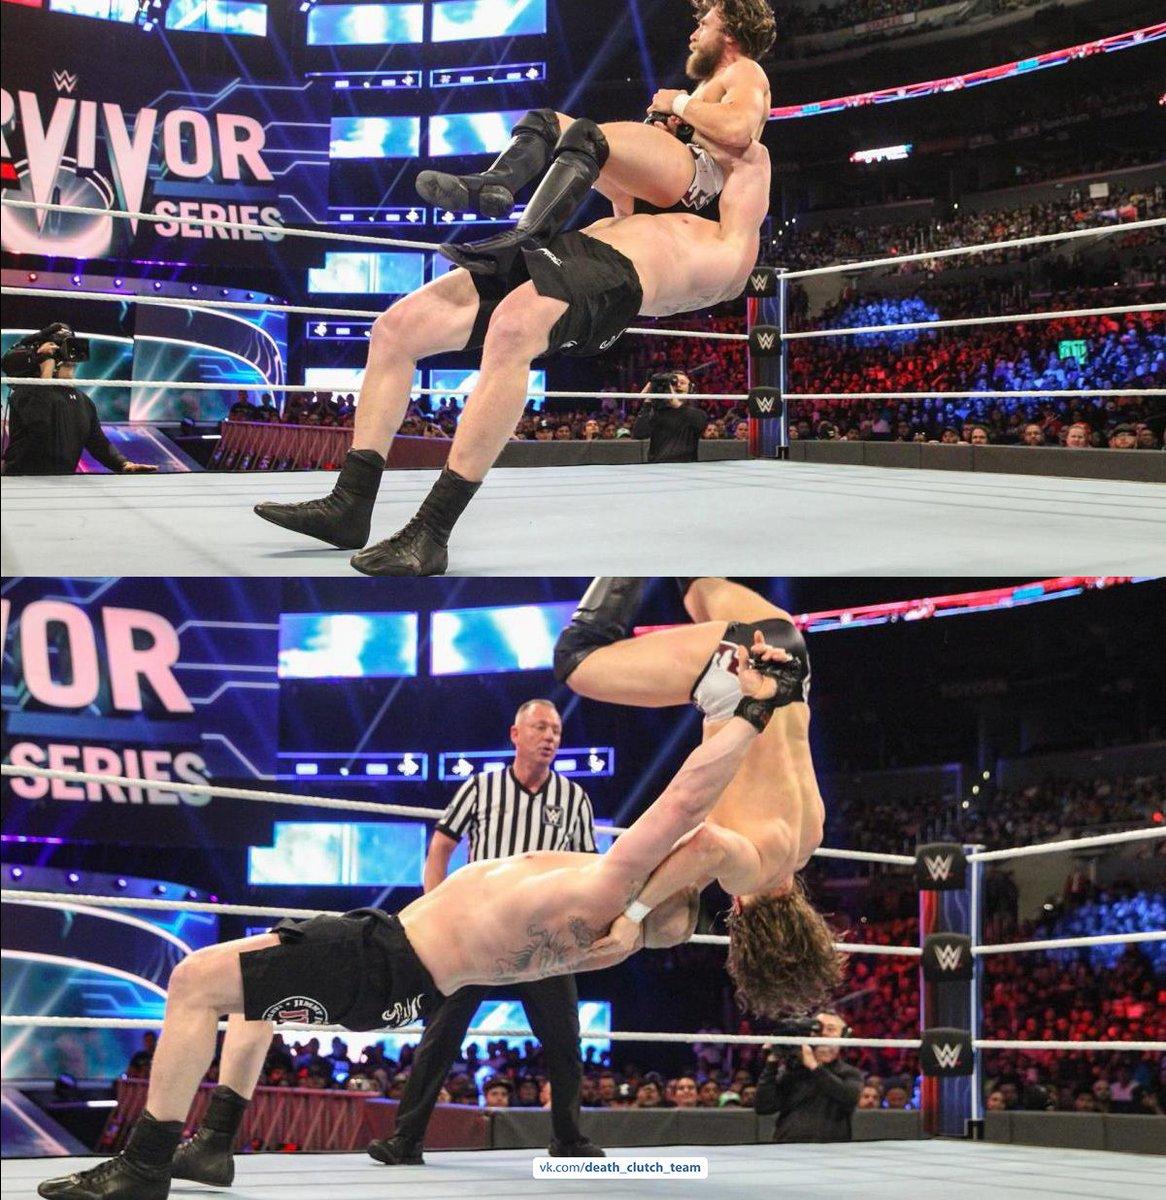 #SuplexCity   @BrockLesnar @WWE @WWENetwork @WrestleMania